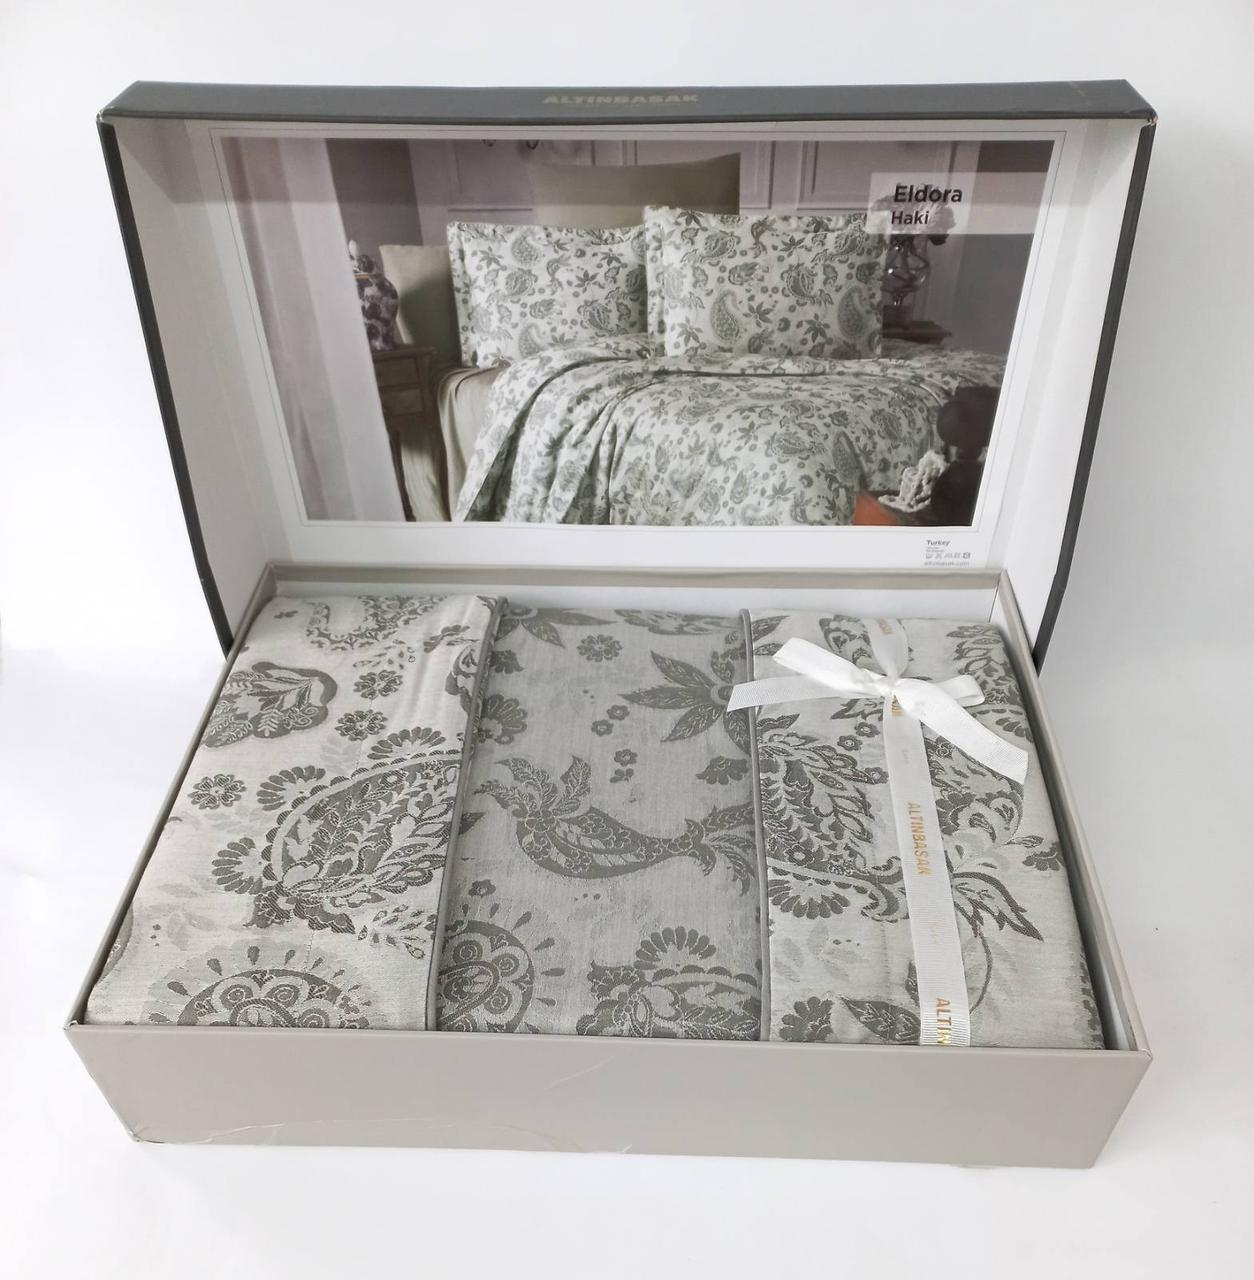 Постельное белье Altinbasak сатин жакард 200x220 Eldora Haki